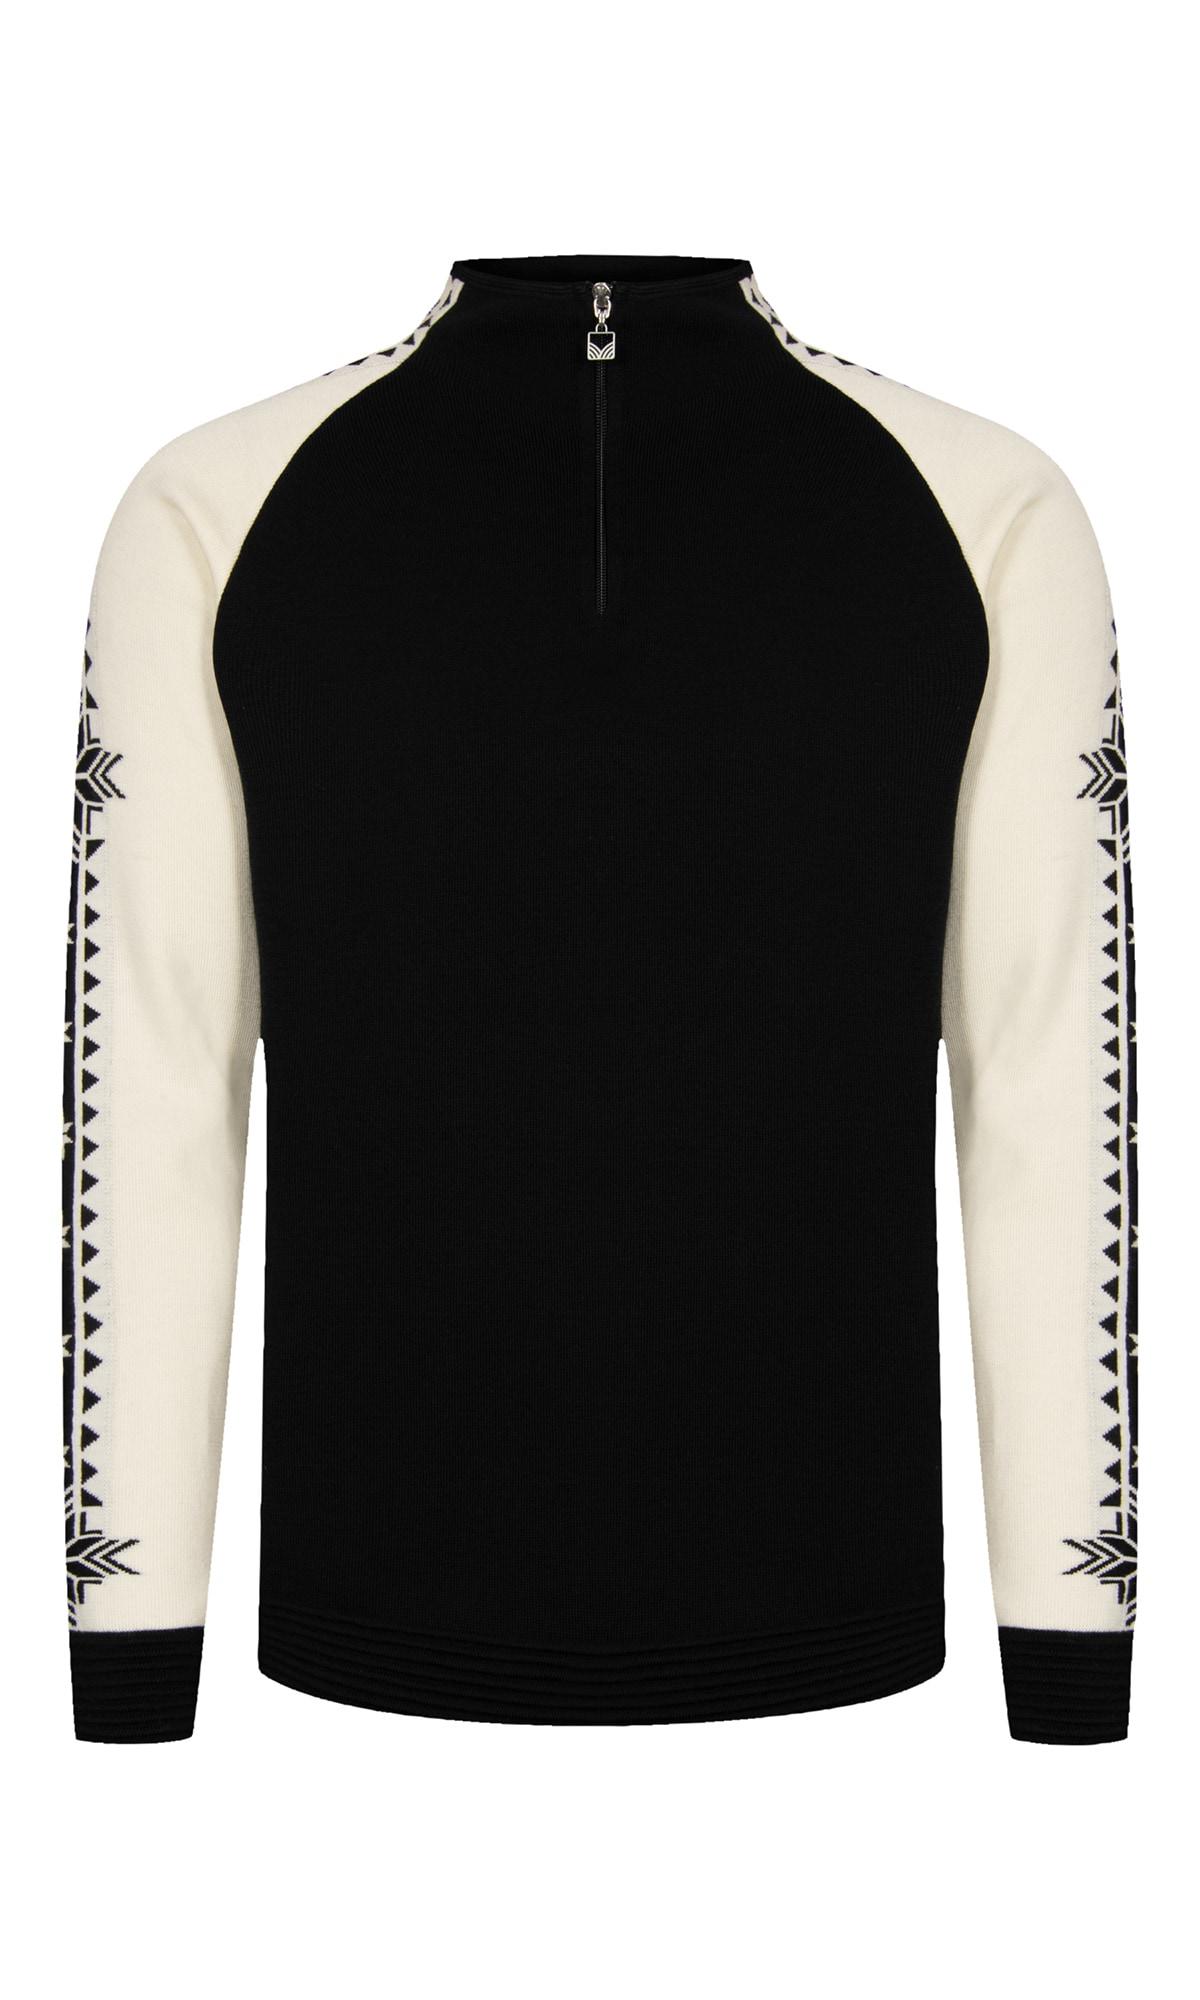 Dale Geilo Masc Sweater M's